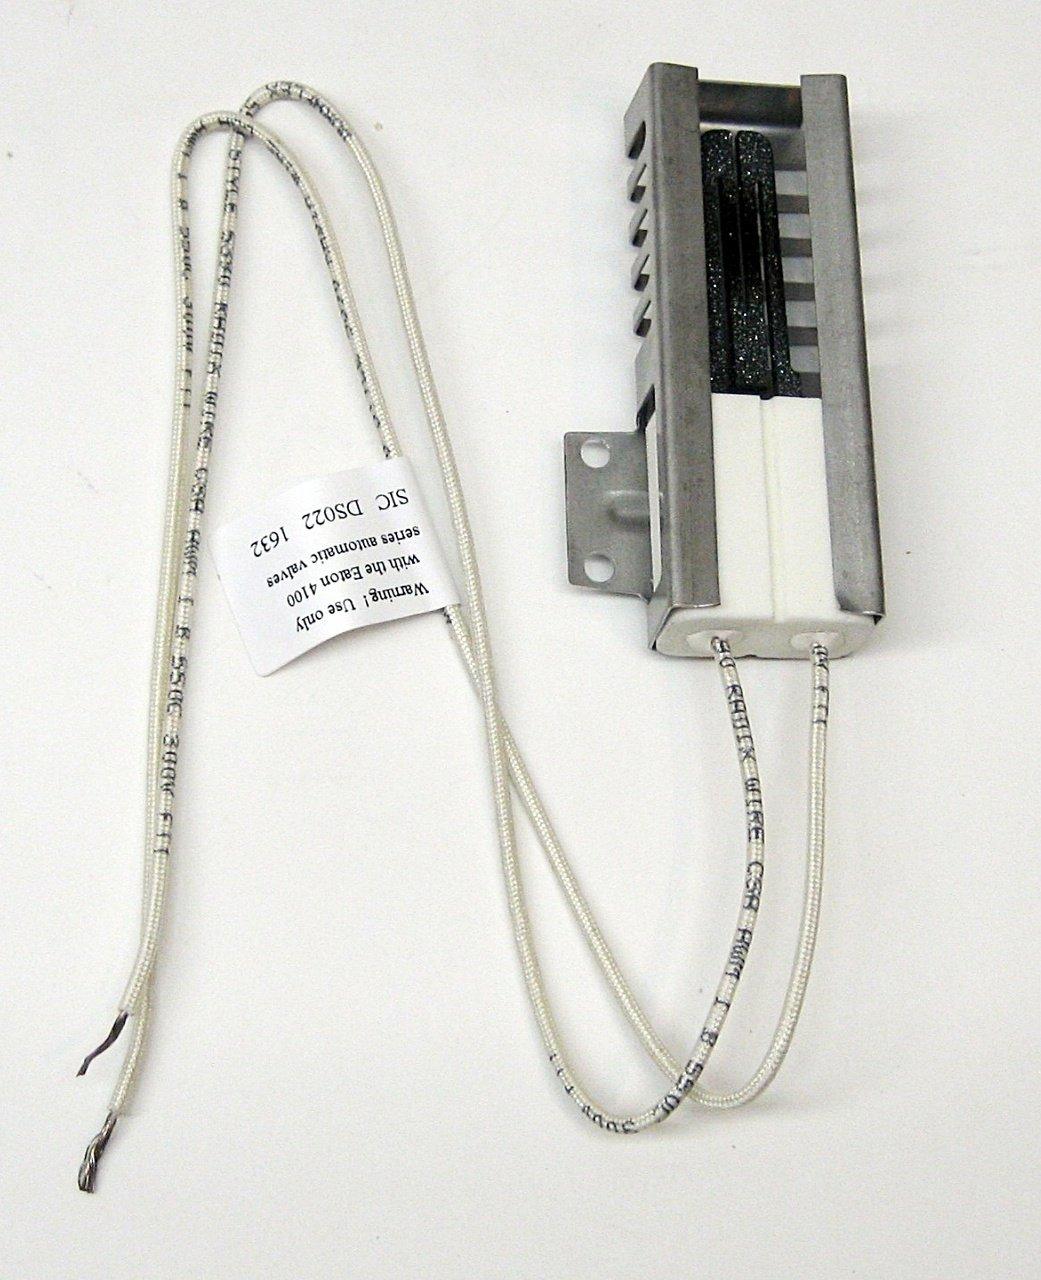 Electrolux WCI-5303935066 Range Oven Ignitor